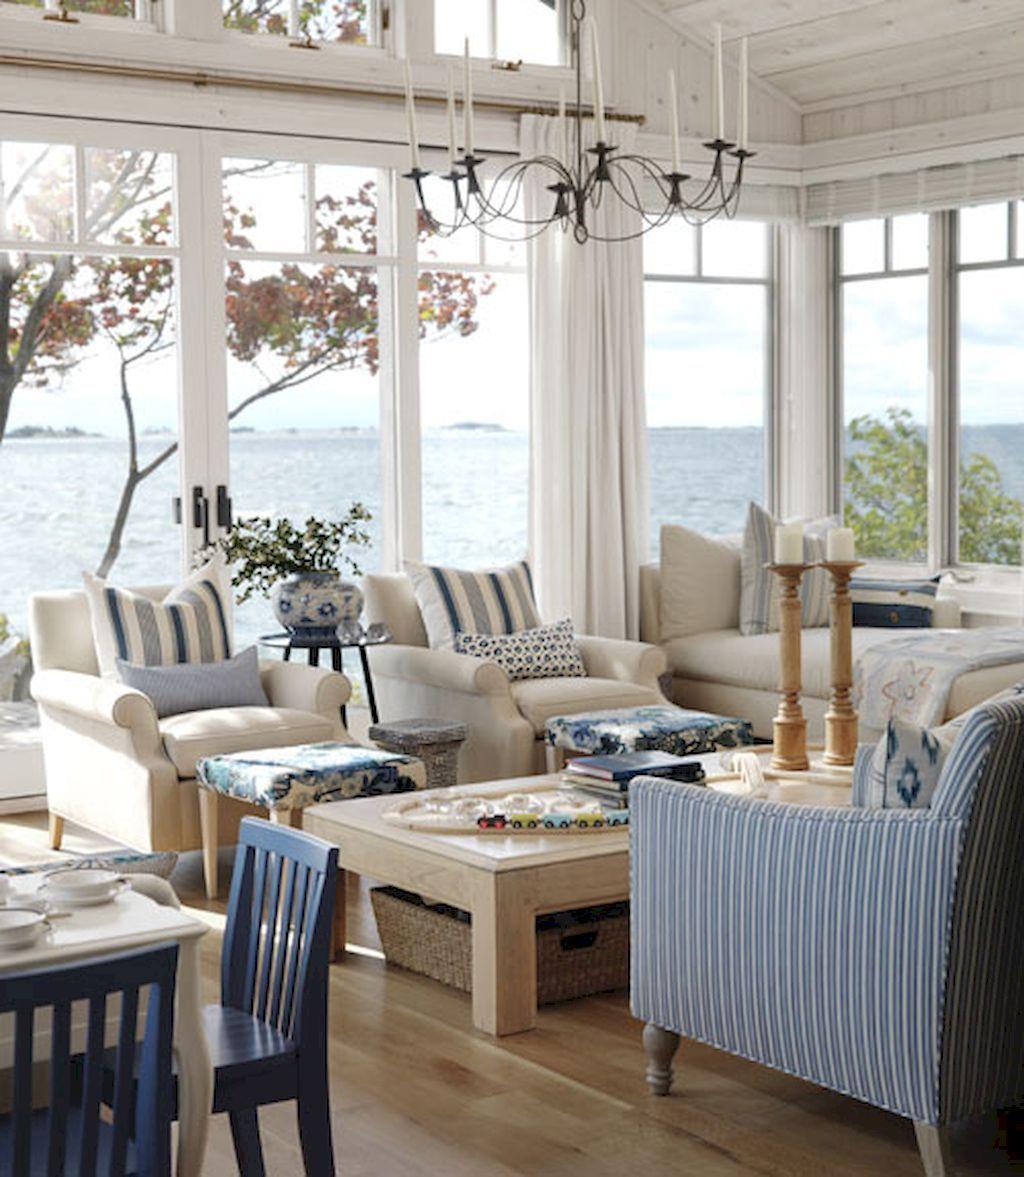 65 Comfy Coastal Living Room Decorating Ideas | Cottage ...